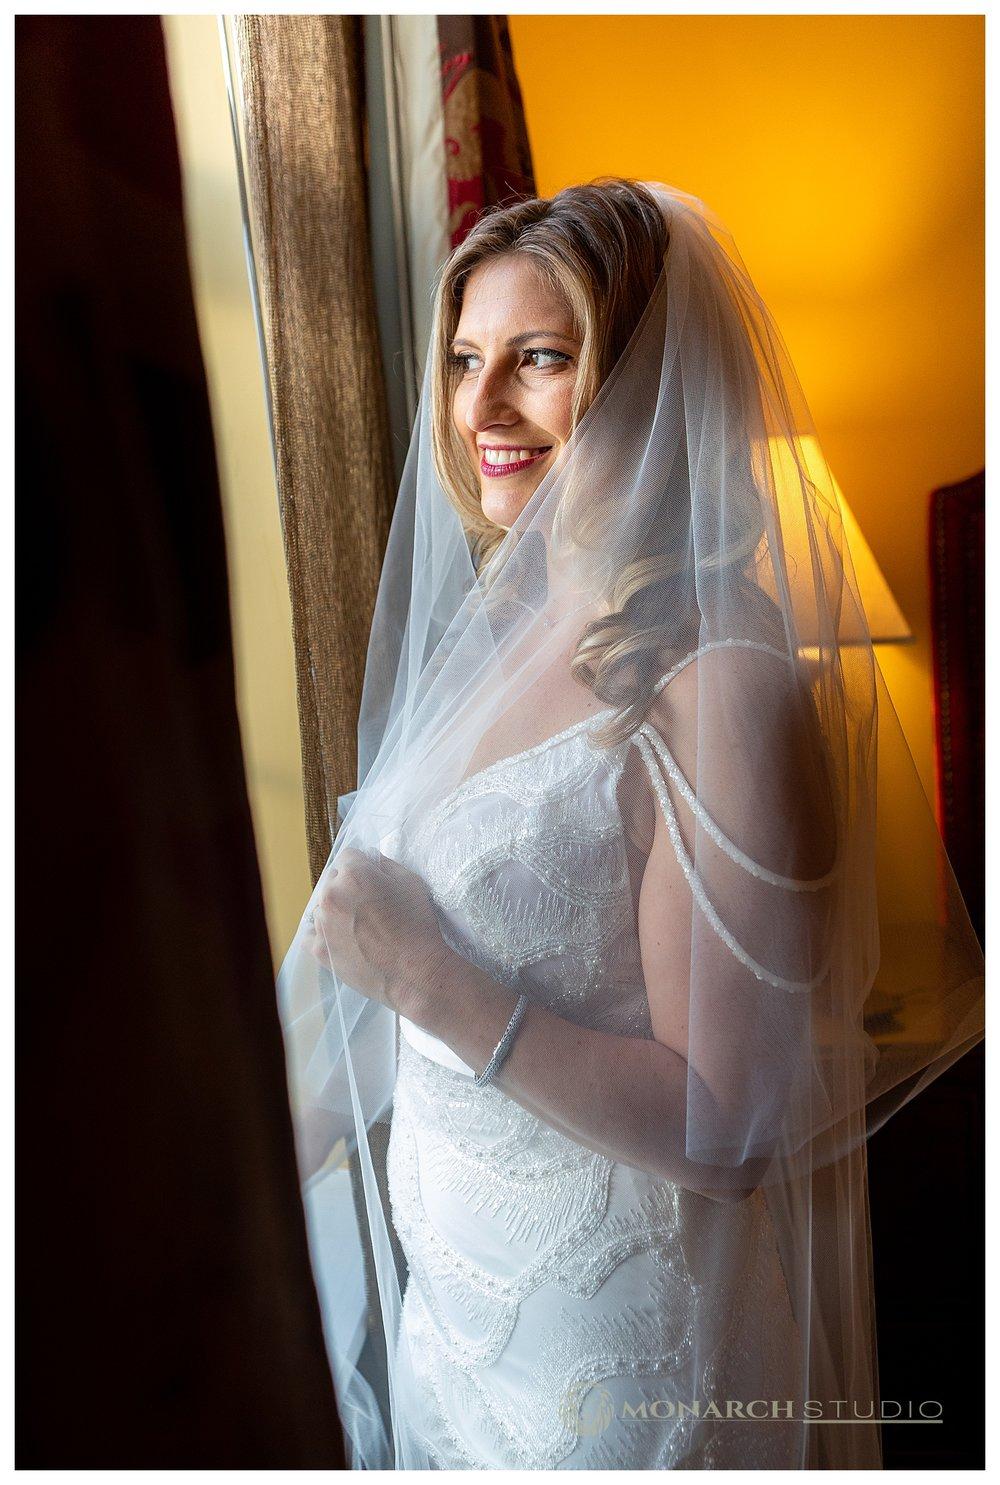 Lightner Museum Wedding Photography 010.JPG